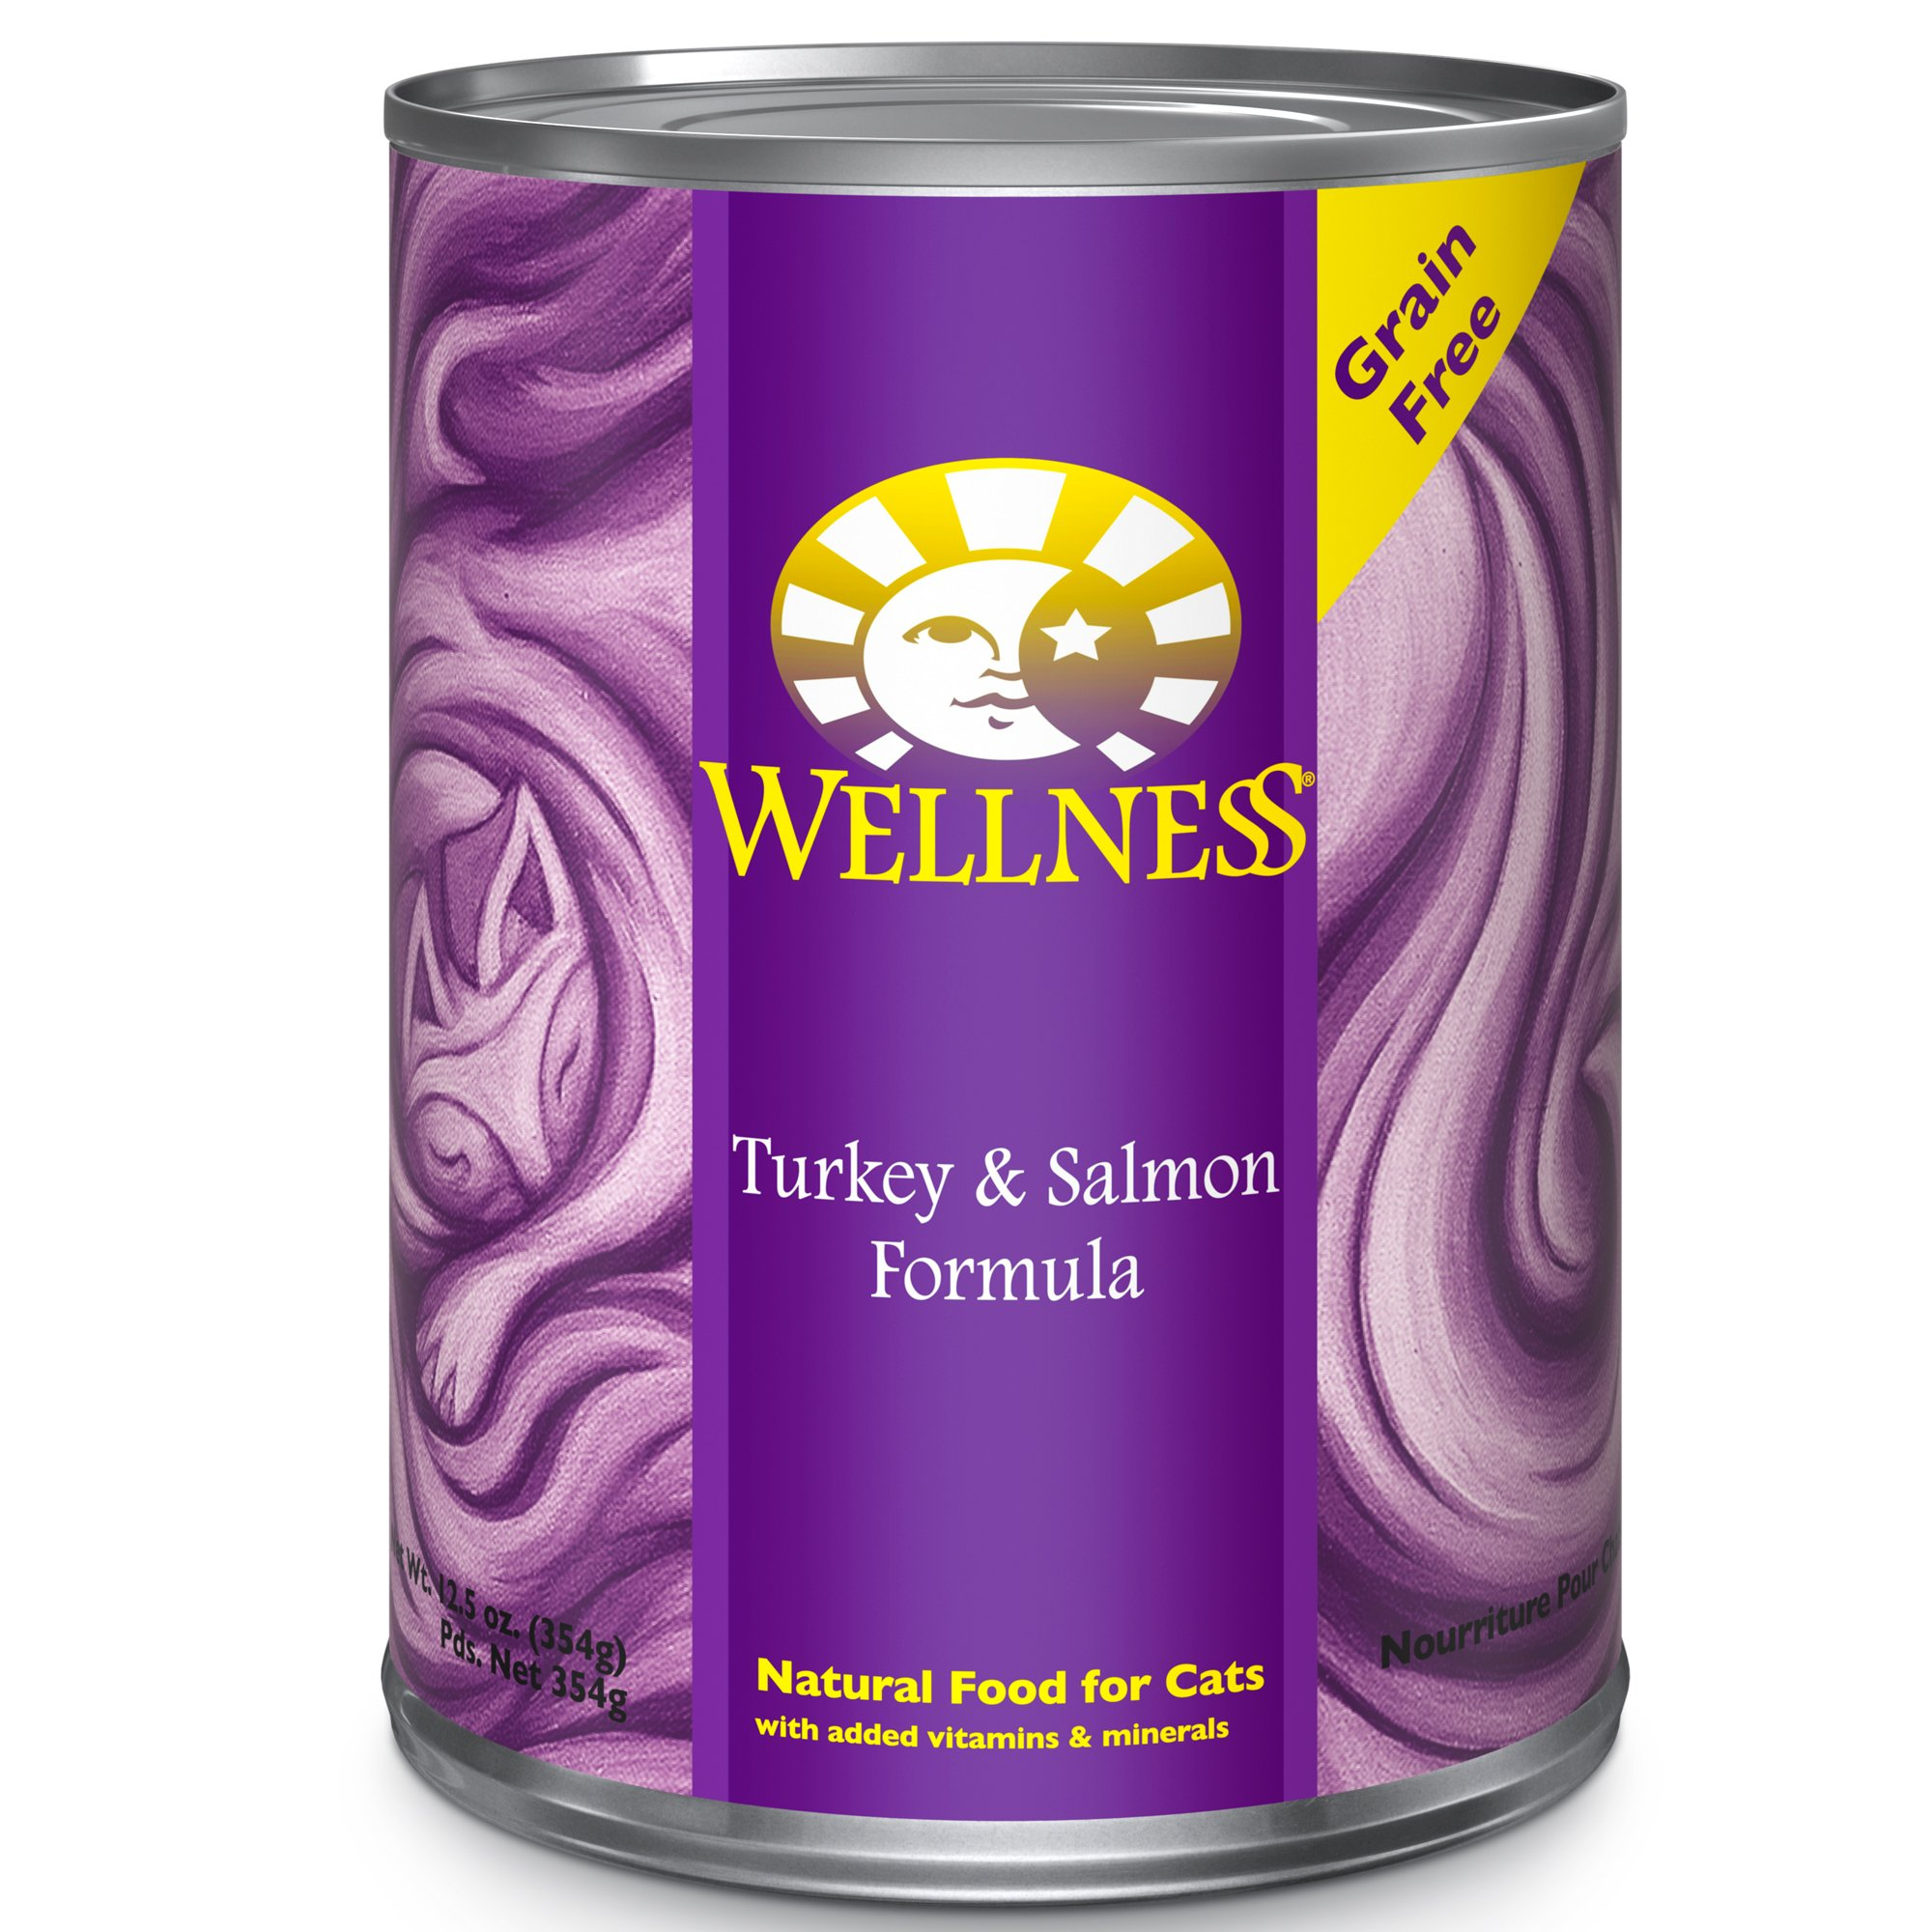 Wellness Adult Canned Cat Food, Turkey & Salmon